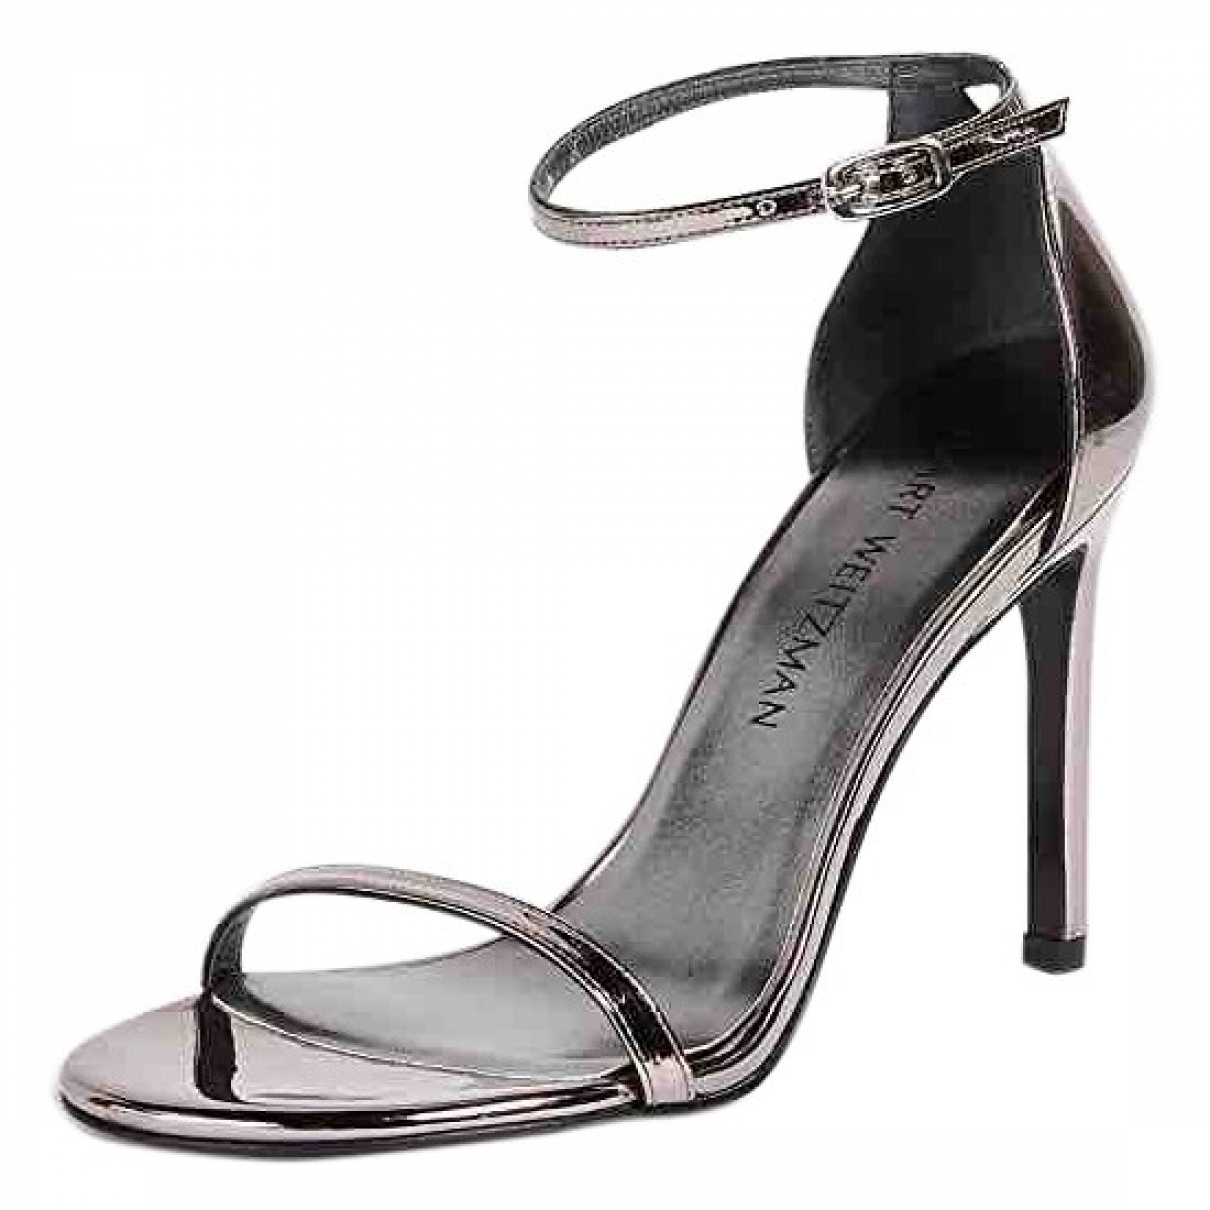 Stuart Weitzman \N Metallic Leather Sandals for Women 11 US